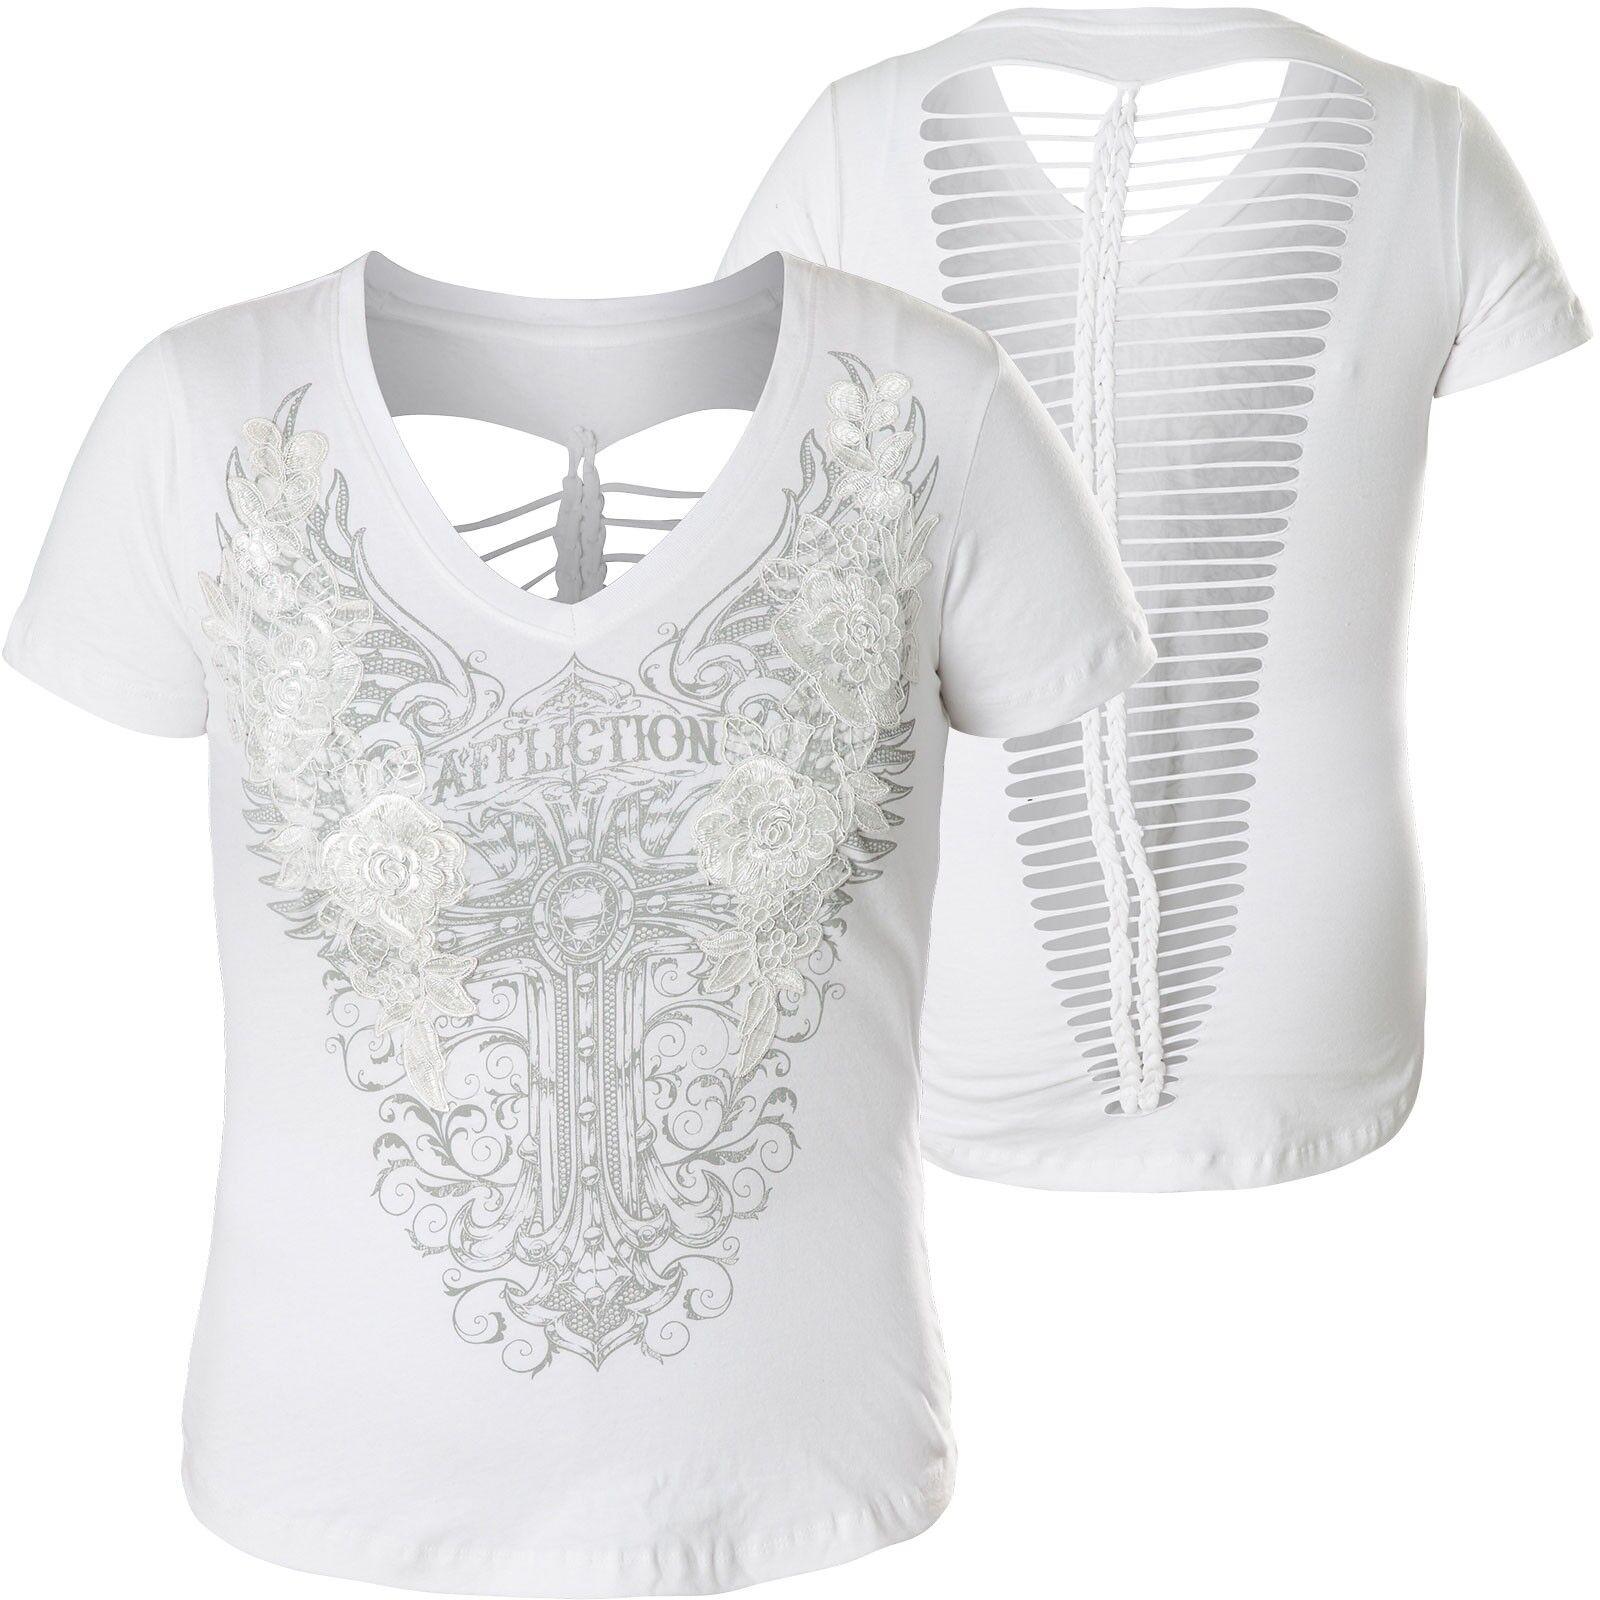 AFFLICTION Damen T-Shirt Lorelei Weiß